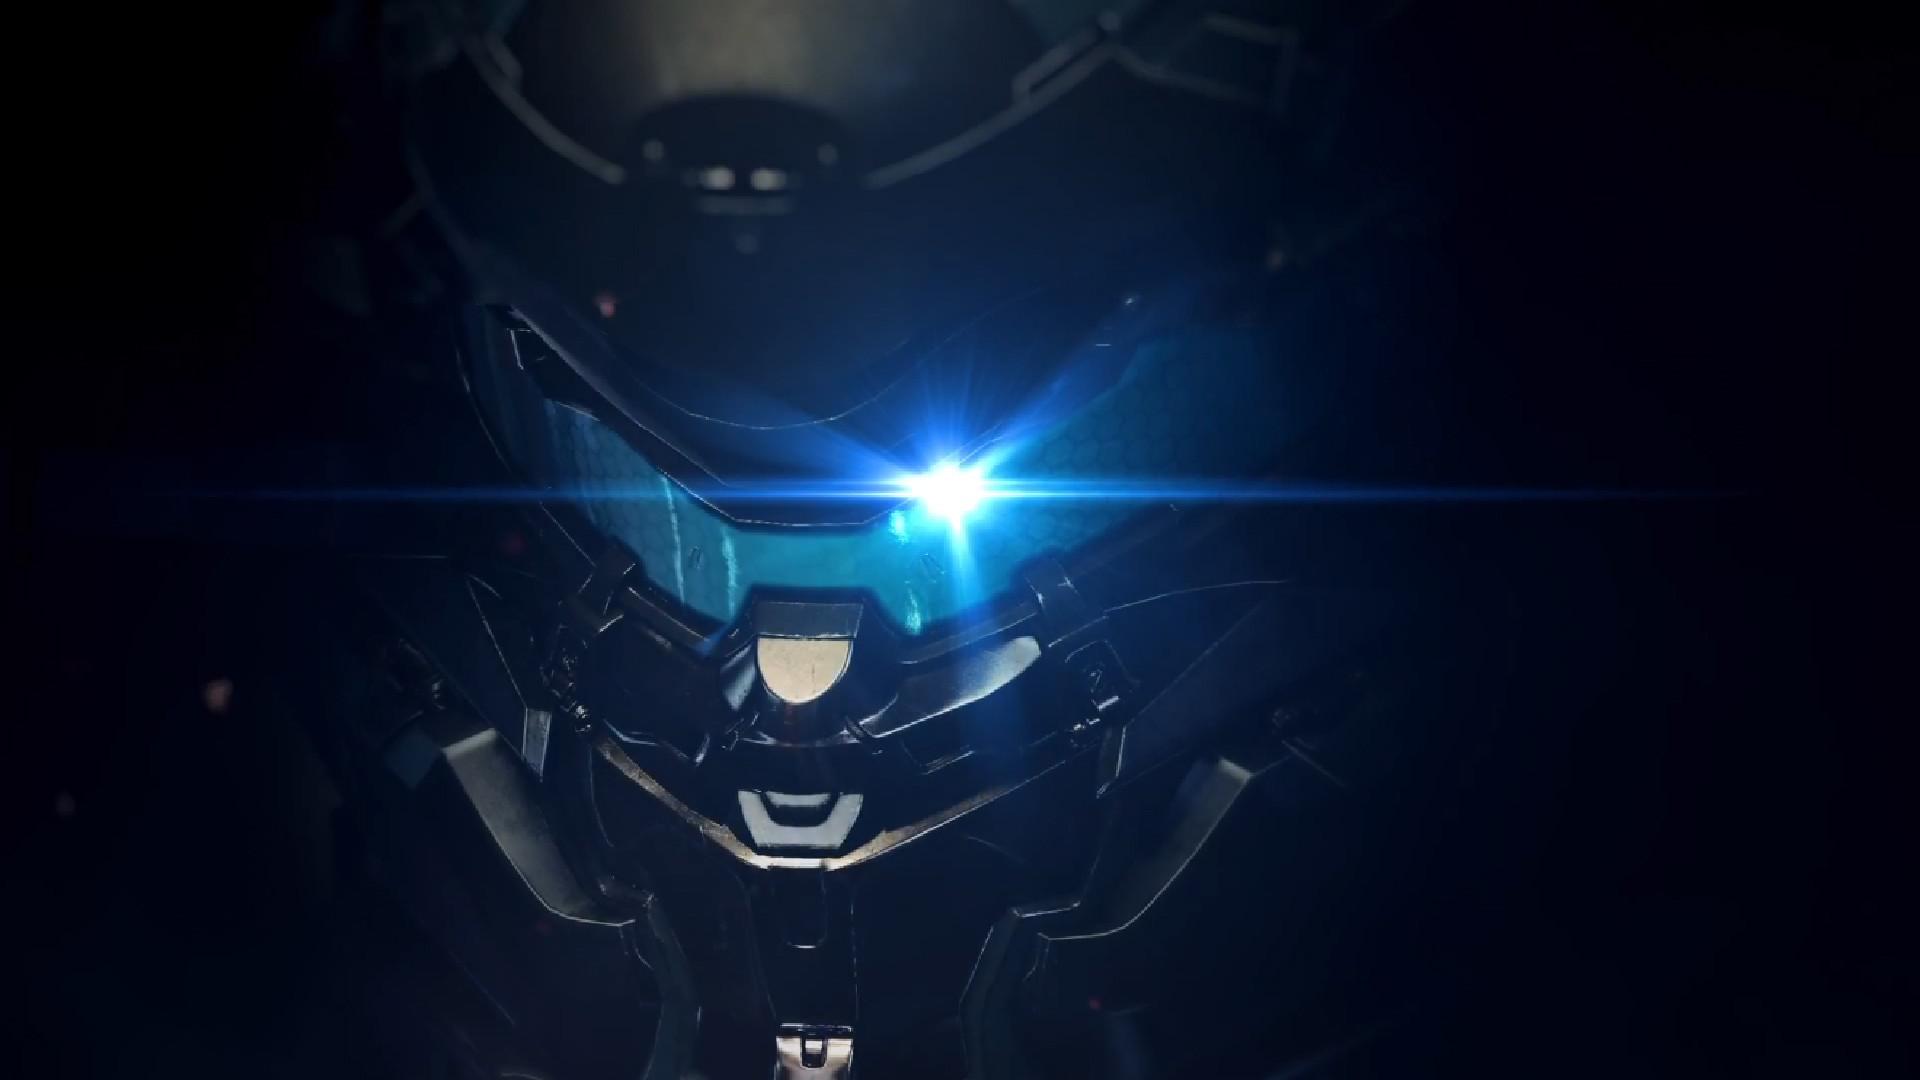 Halo 5 Animated Wallpaper – WallpaperSafari